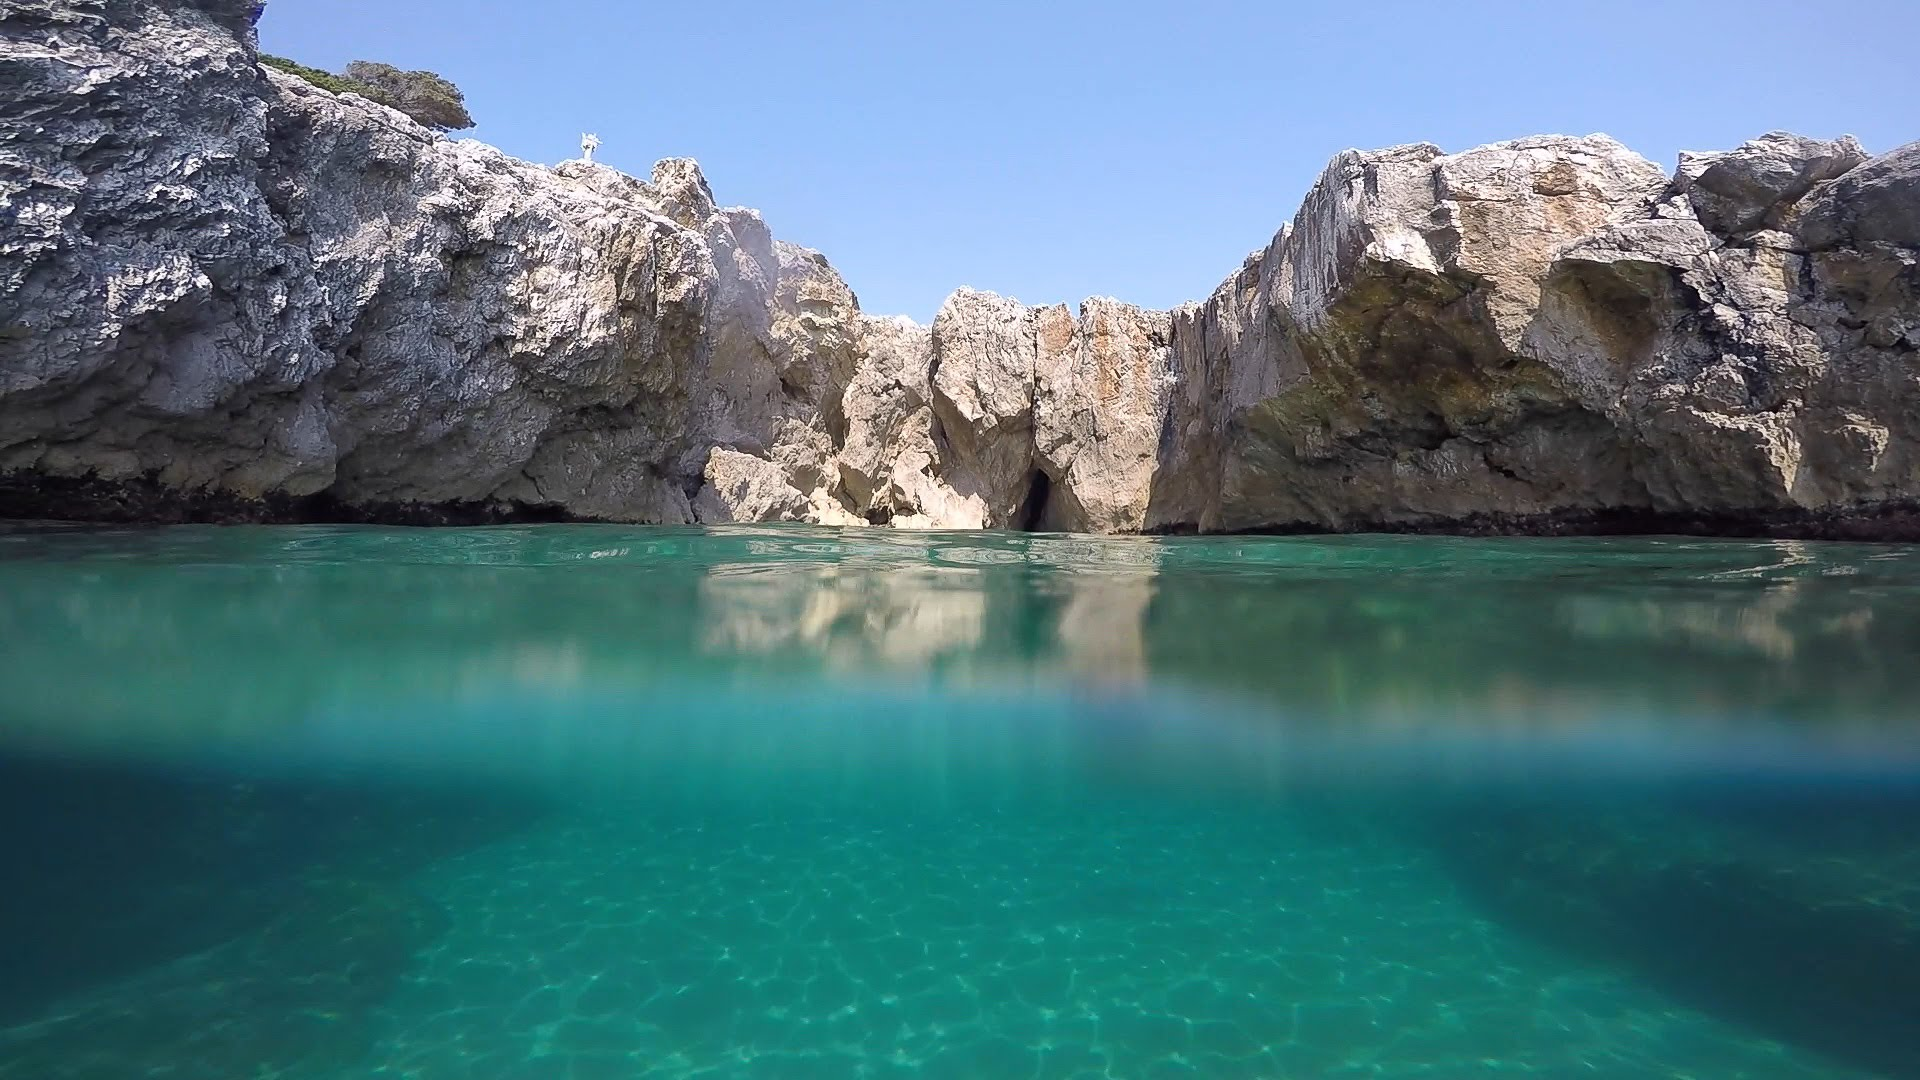 Spiaggia di San Felice Circeo